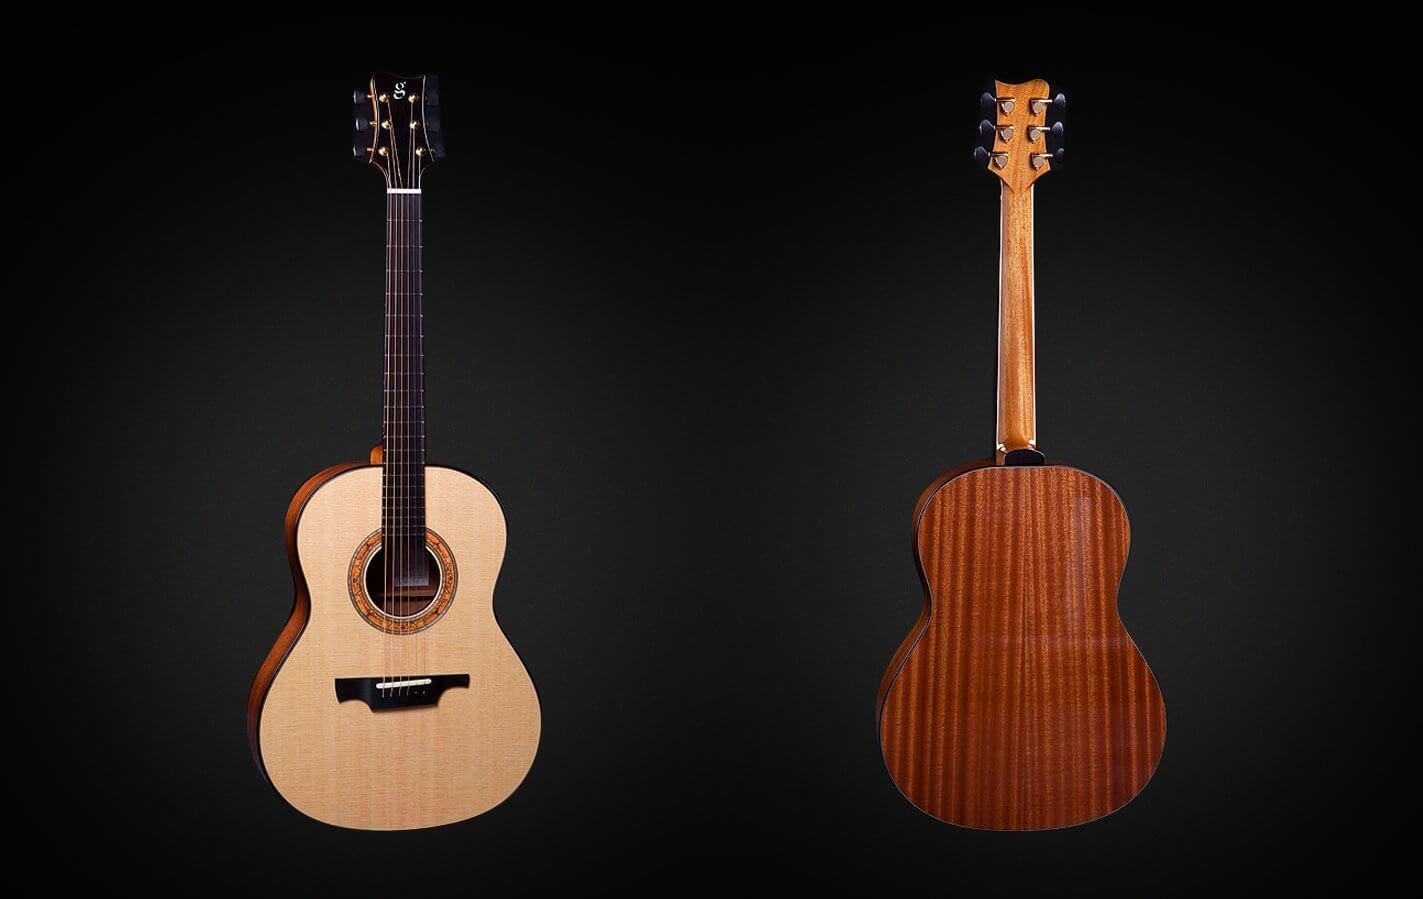 Greenfield Guitars | Fine handmade Acoustic Guitars Model GF, Sitka spruce, sapele mahogany, non-cutaway